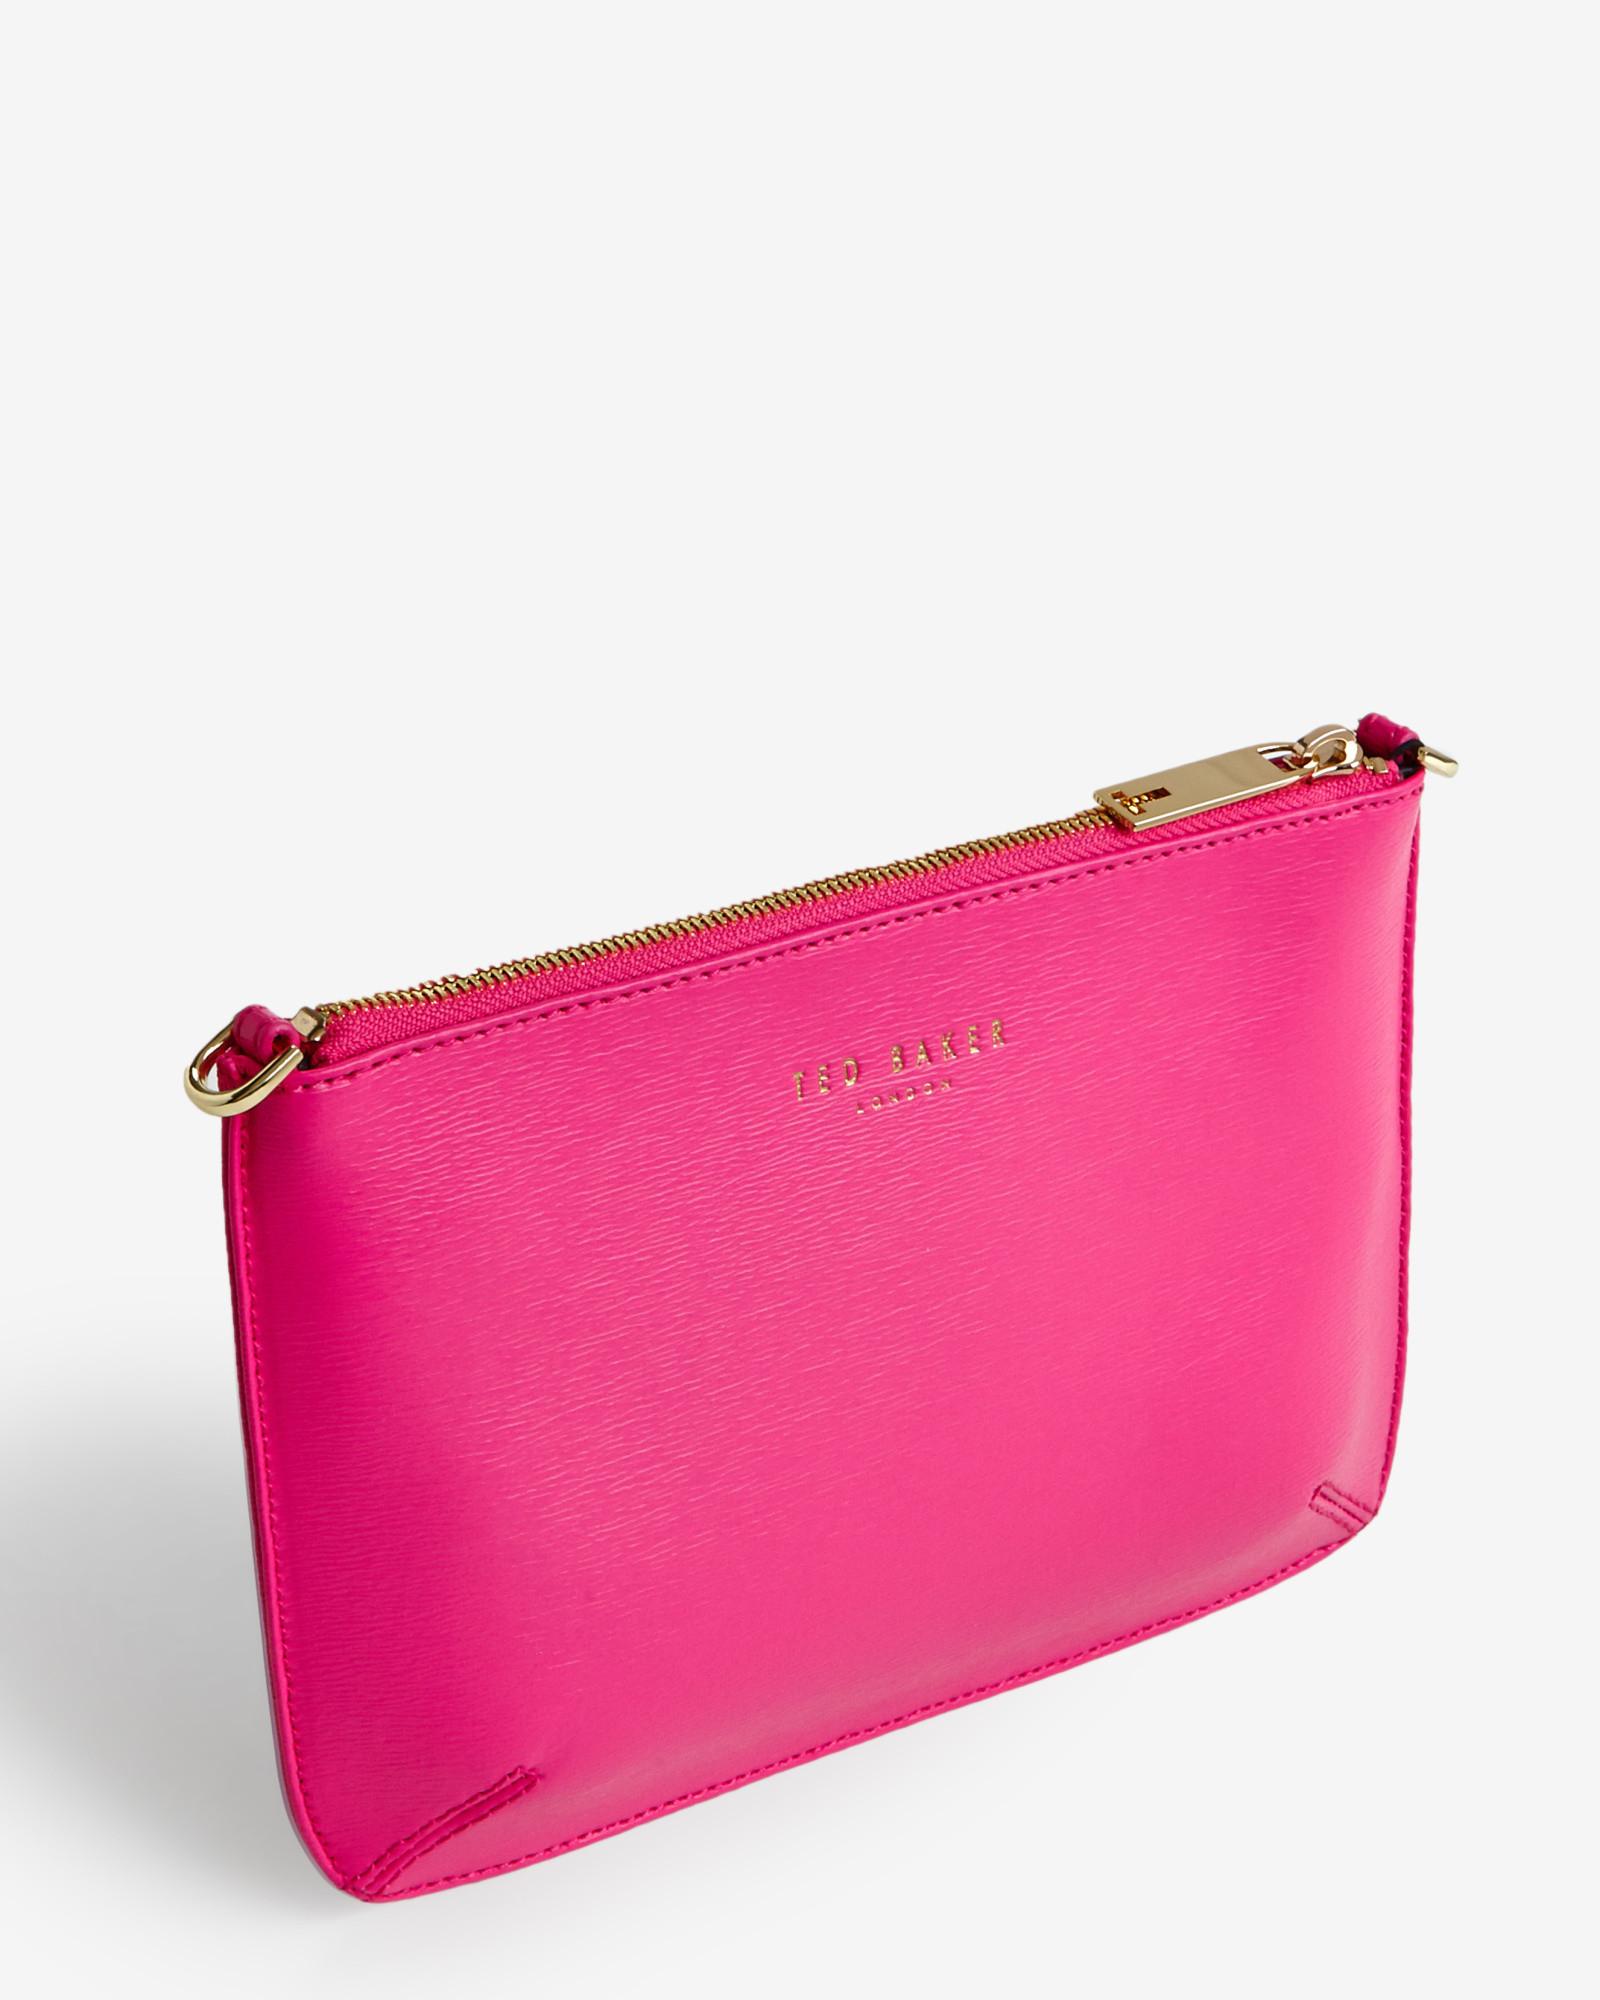 Bright Pink Handbag Mc Luggage